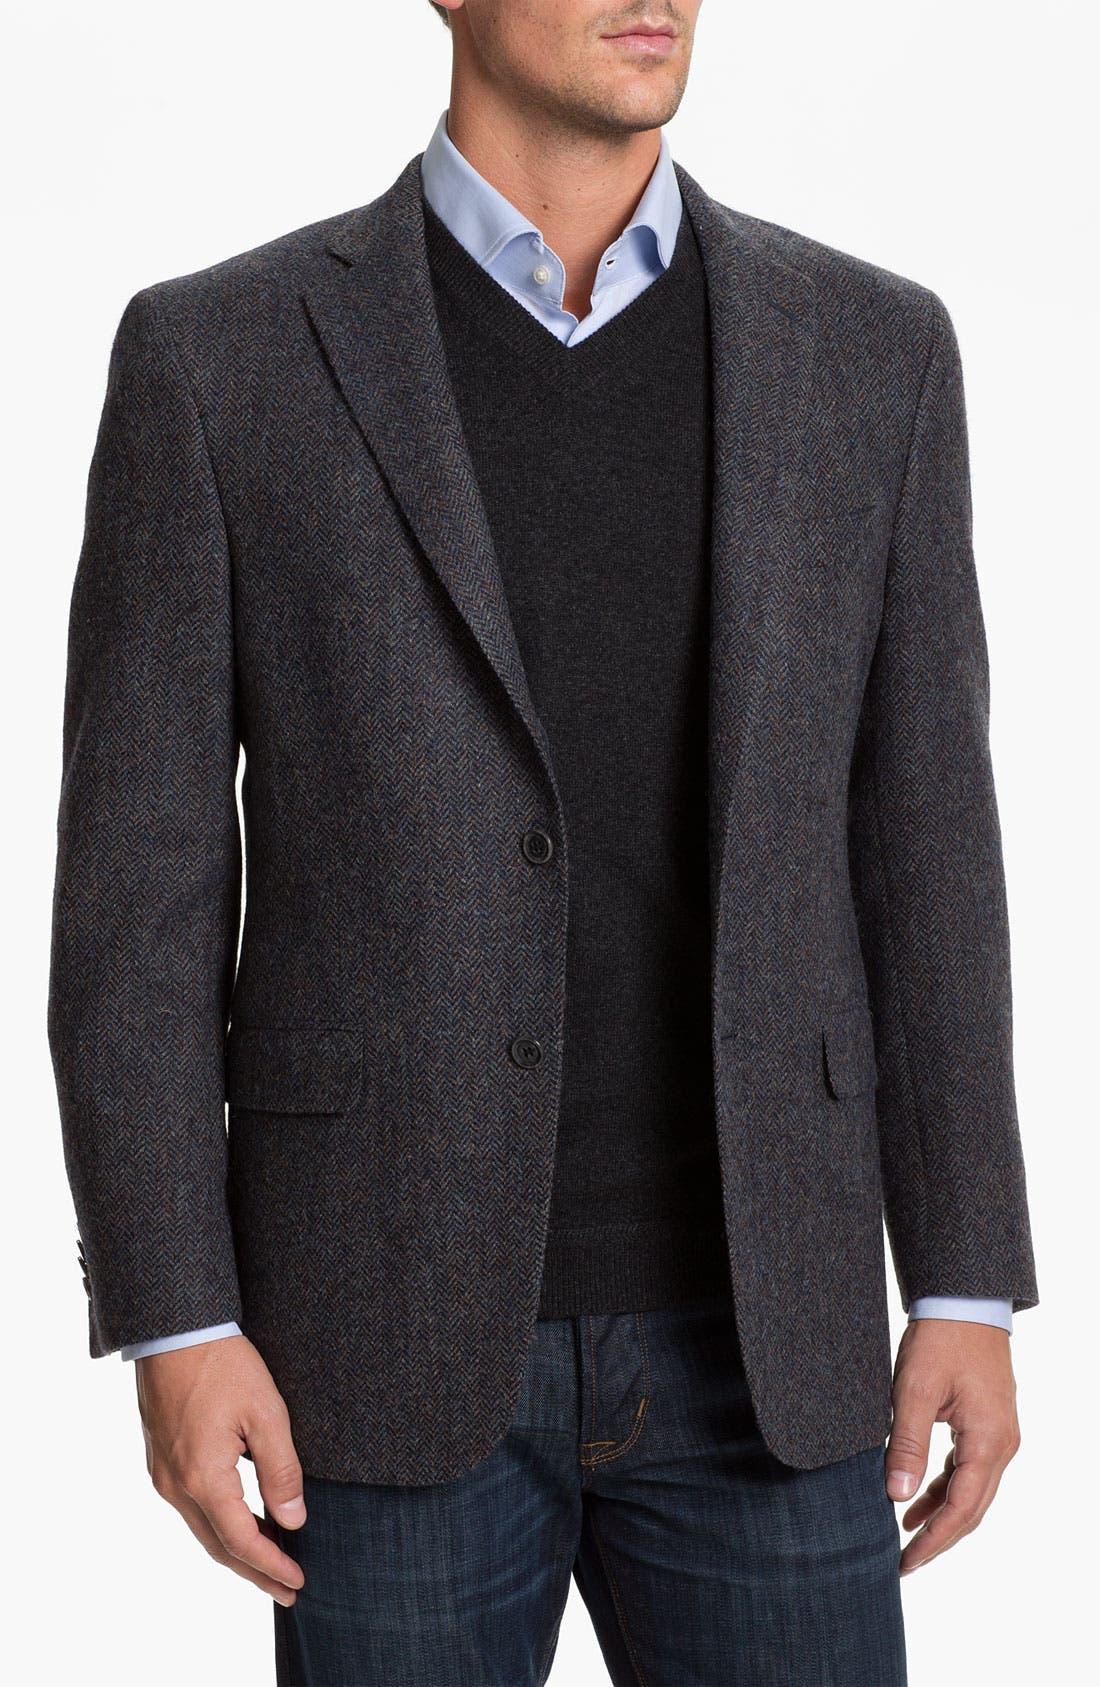 Main Image - Hart Schaffner Marx Herringbone Sportcoat